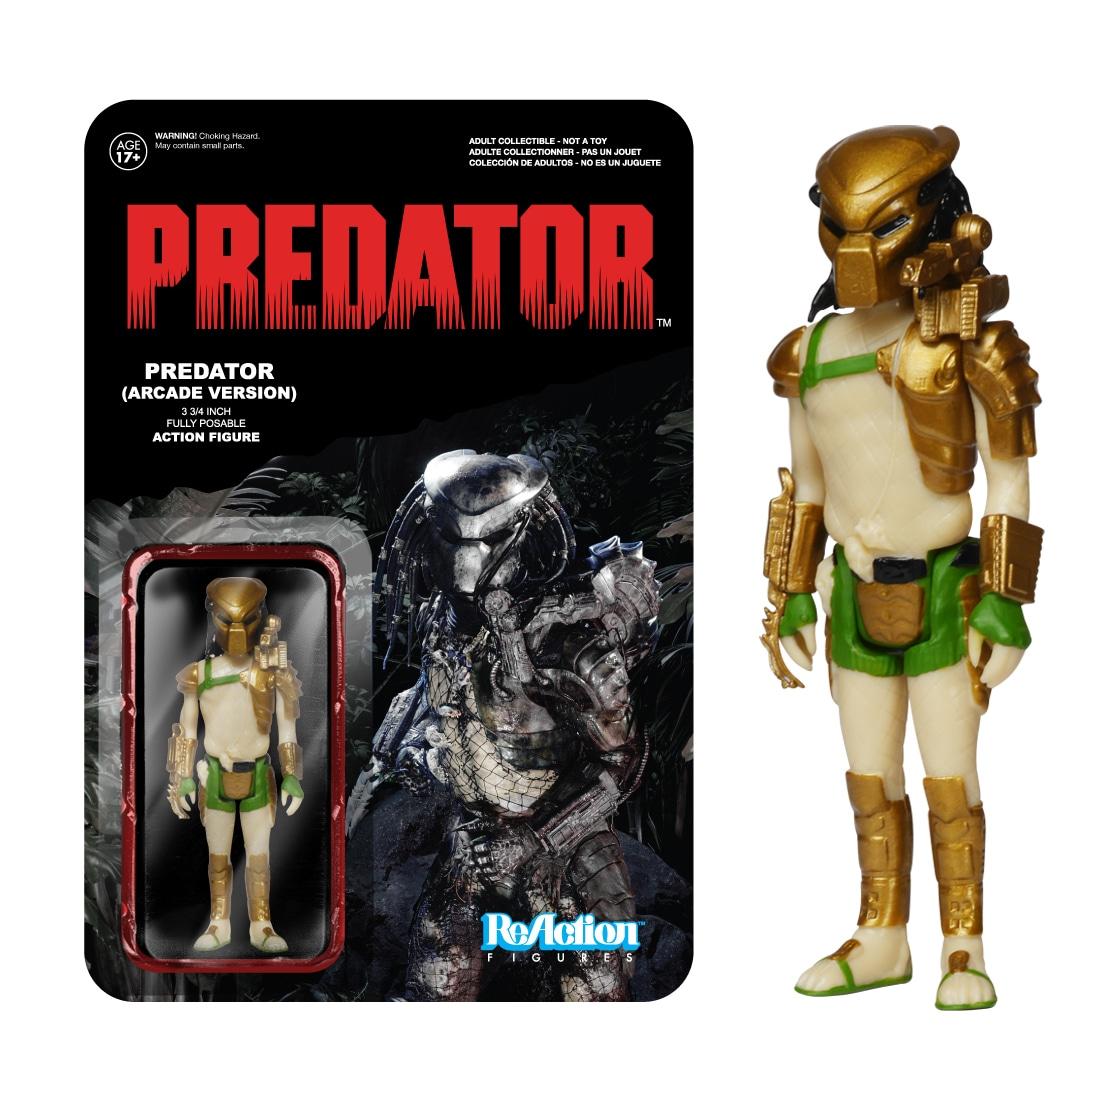 FUNKO INC. Reaction Figures: Predator 3 3/4-inch Fully Po...